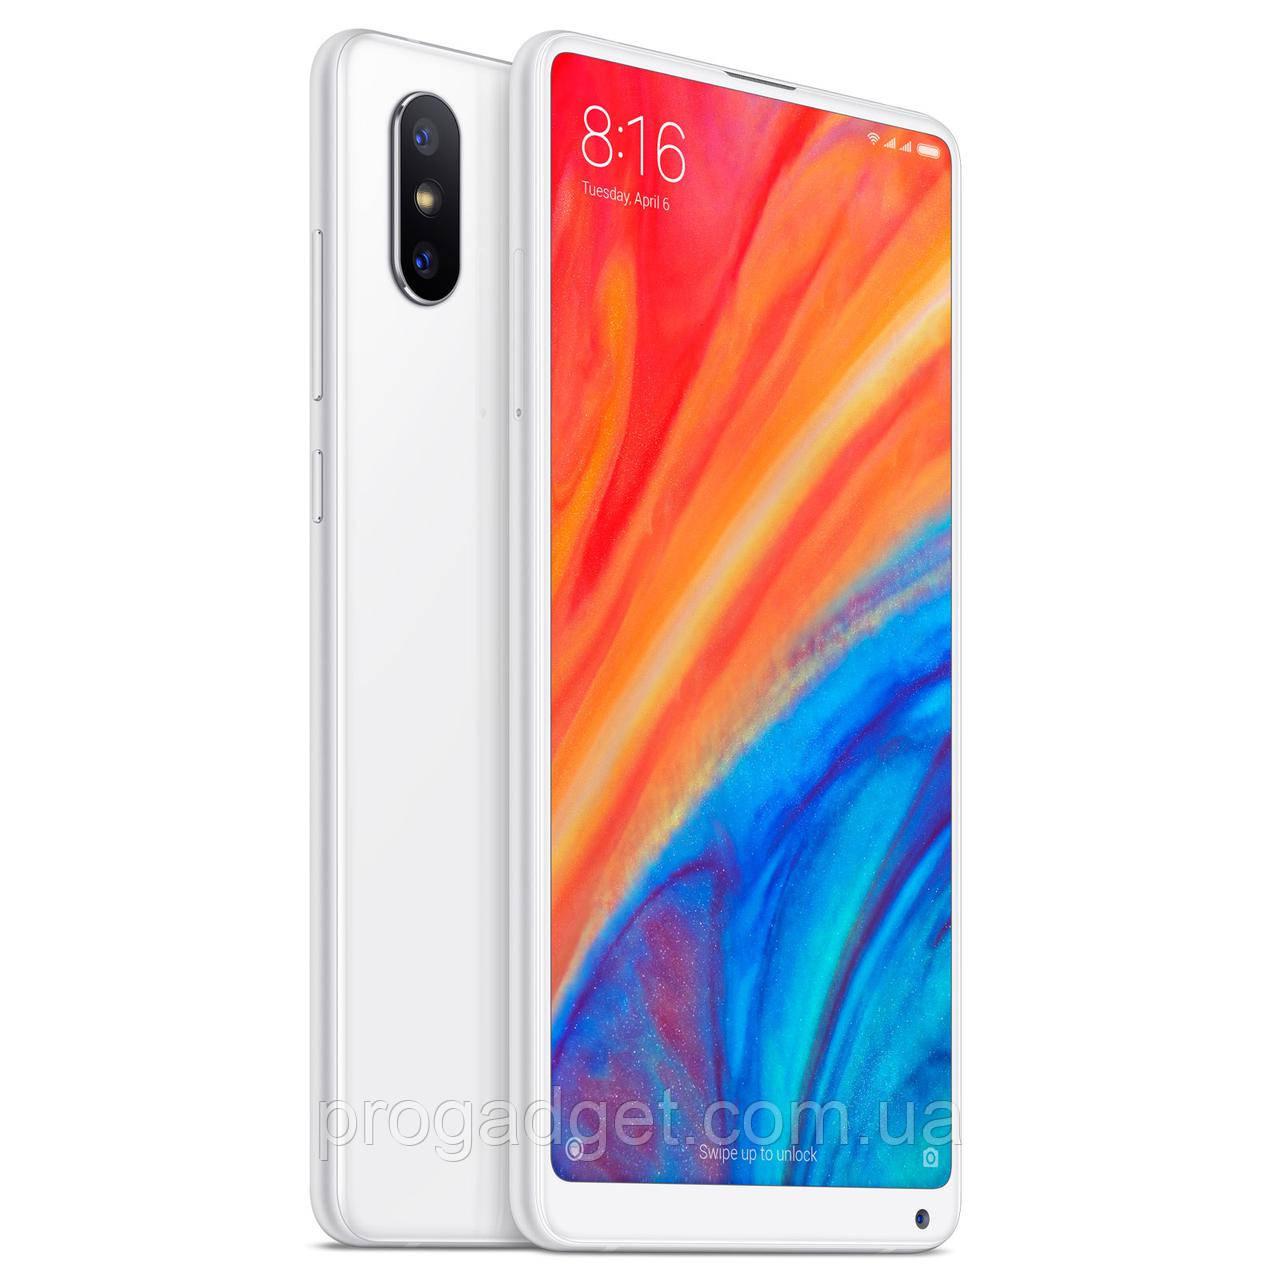 "Xiaomi Mi Mix 2S 6/64 white - белый безрамочный смартфон 5.99"" FullHD+, Snapdragon 845 Global Version Face ID"